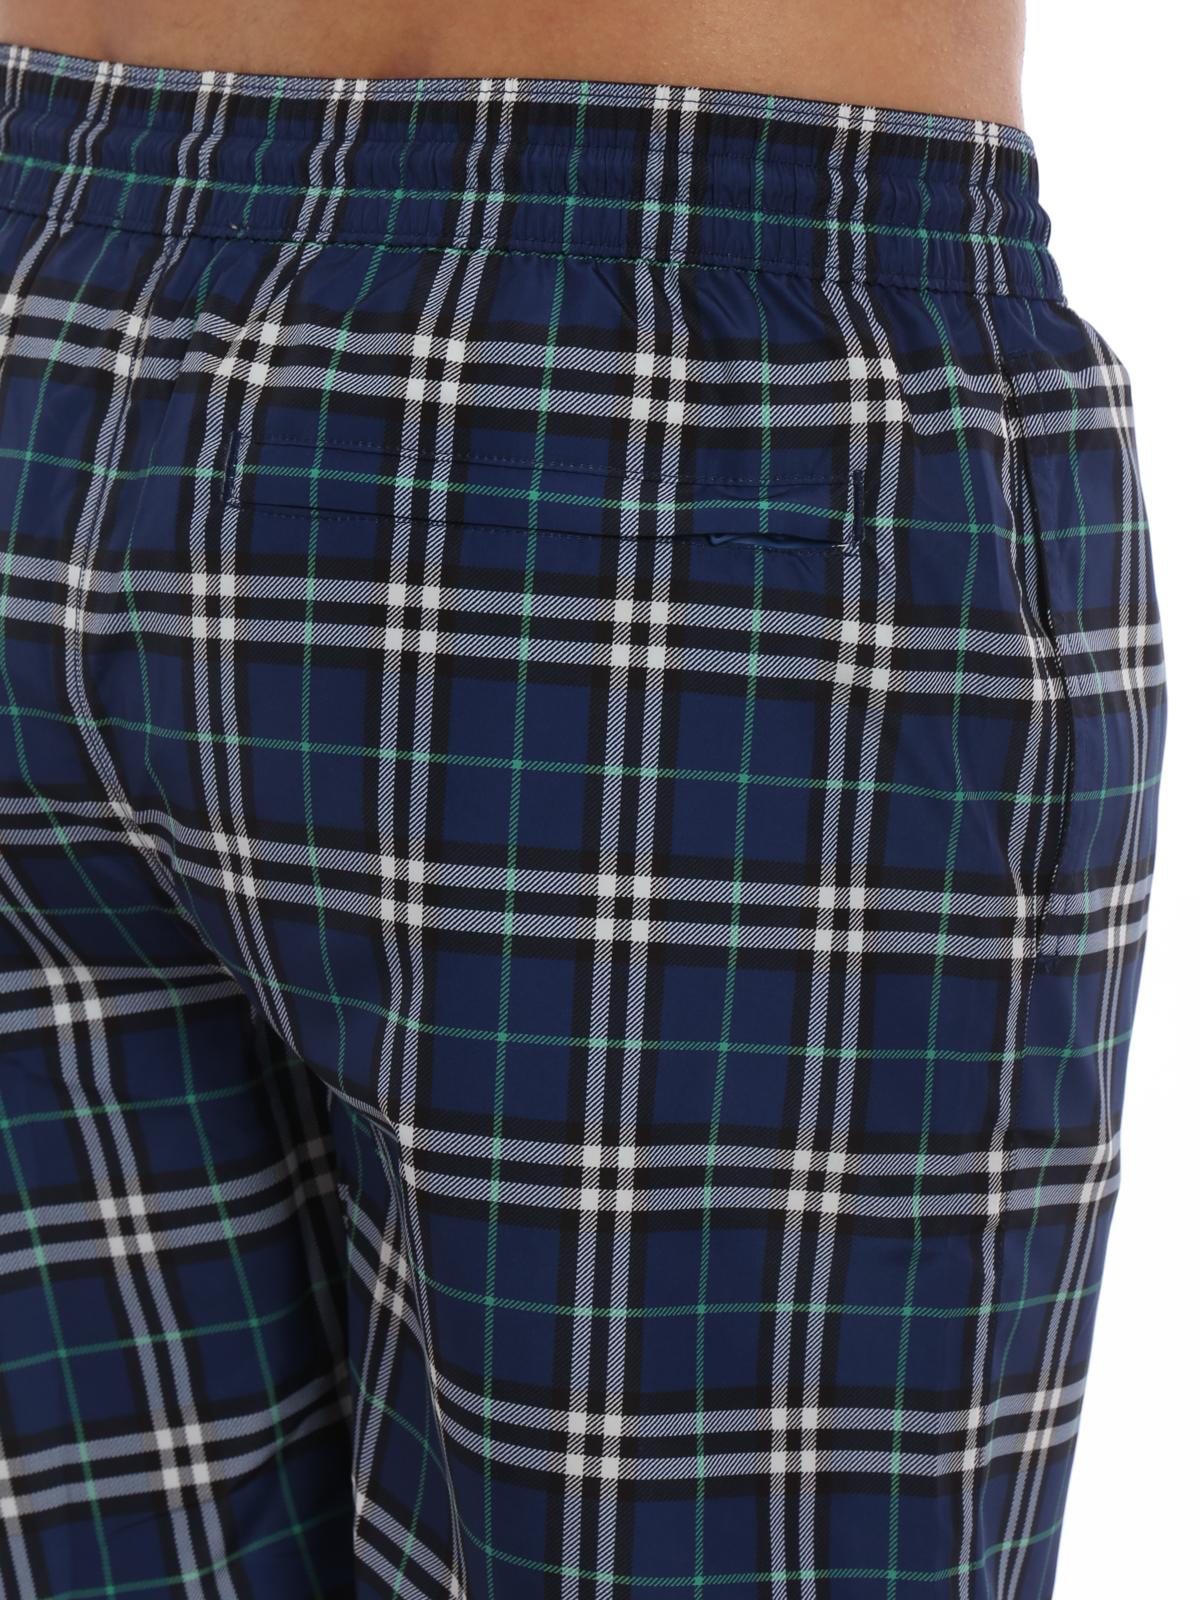 fb516e0af9ce0 Burberry - Guildes blue Check swim shorts - Swim shorts & swimming ...